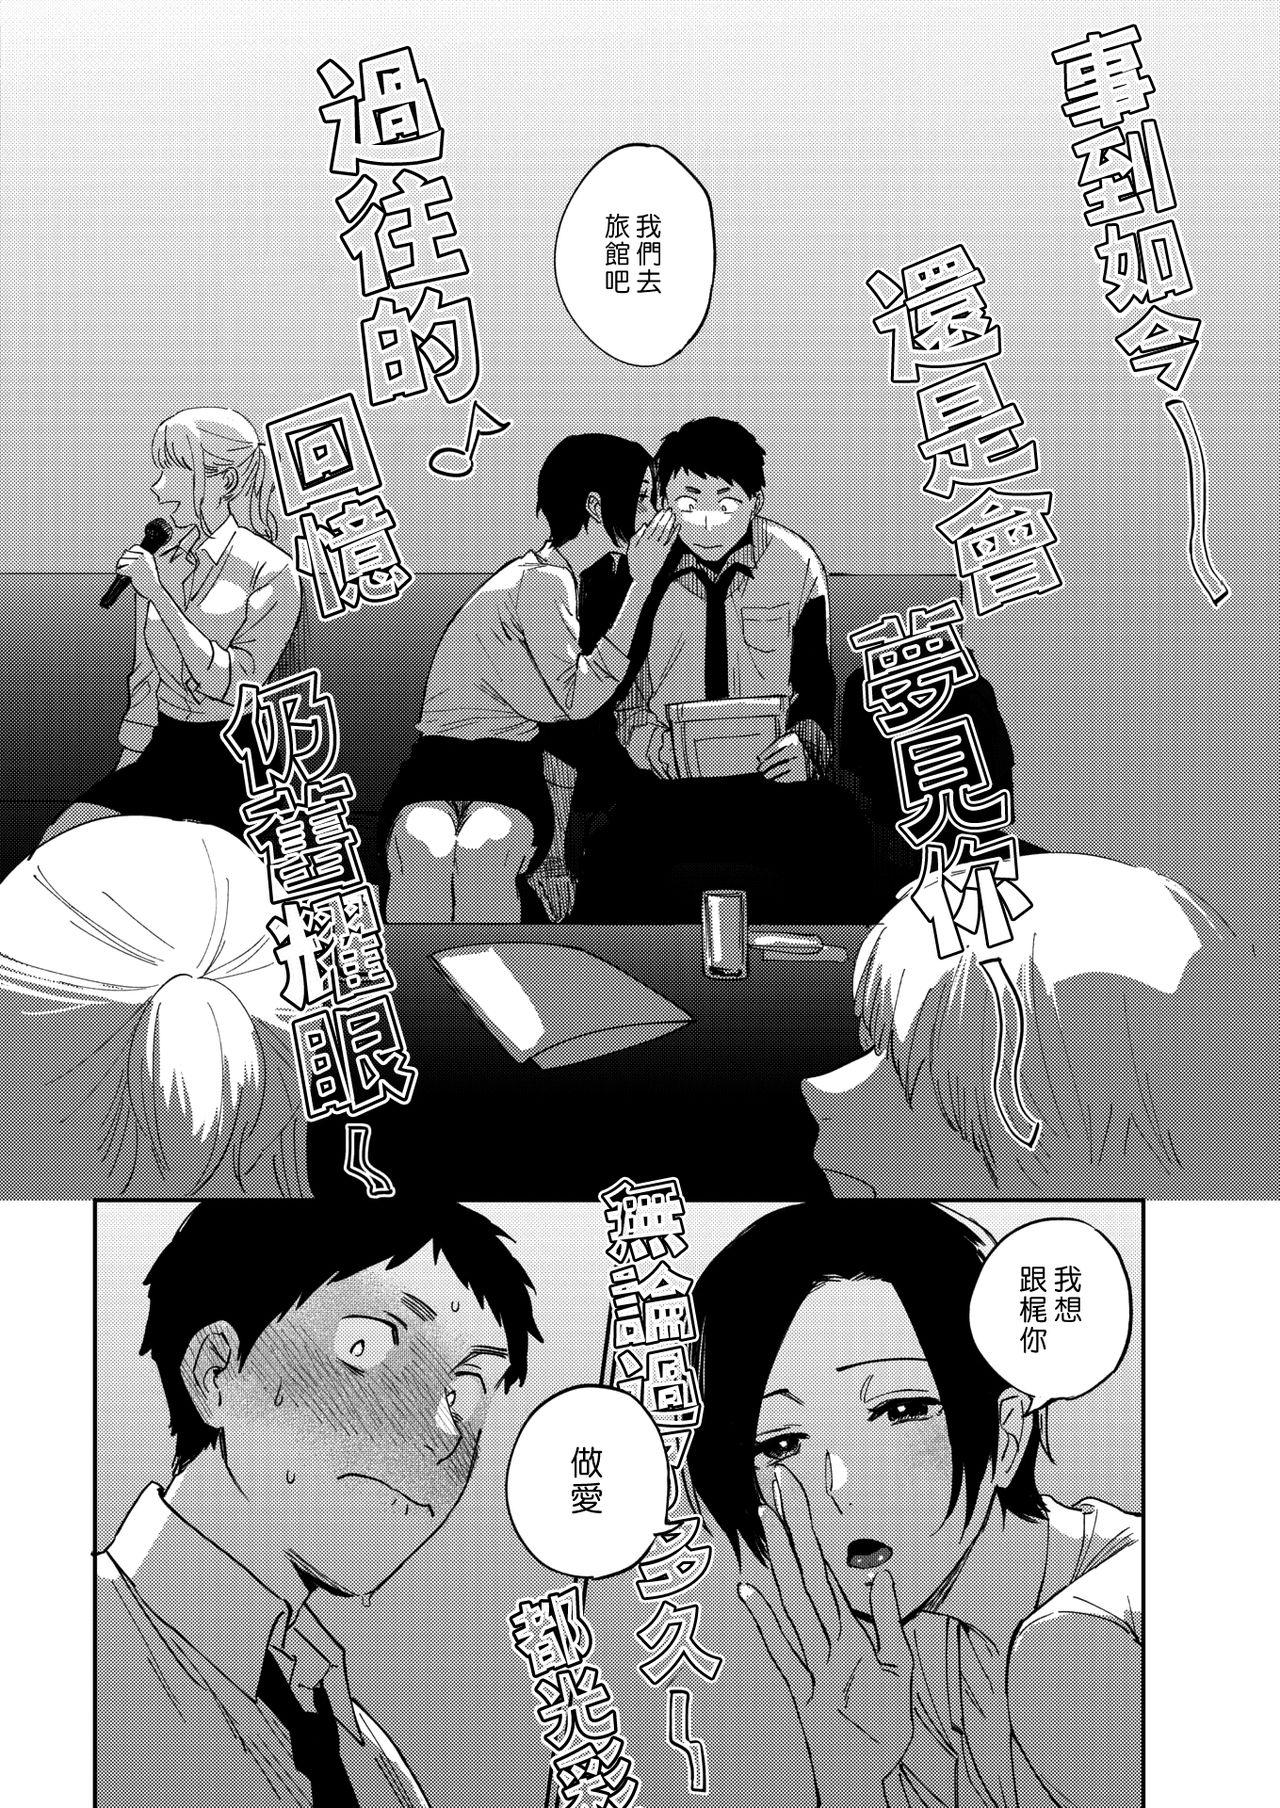 Muramata-san no Himitsu 2 | 村又小姐的秘密 2 5